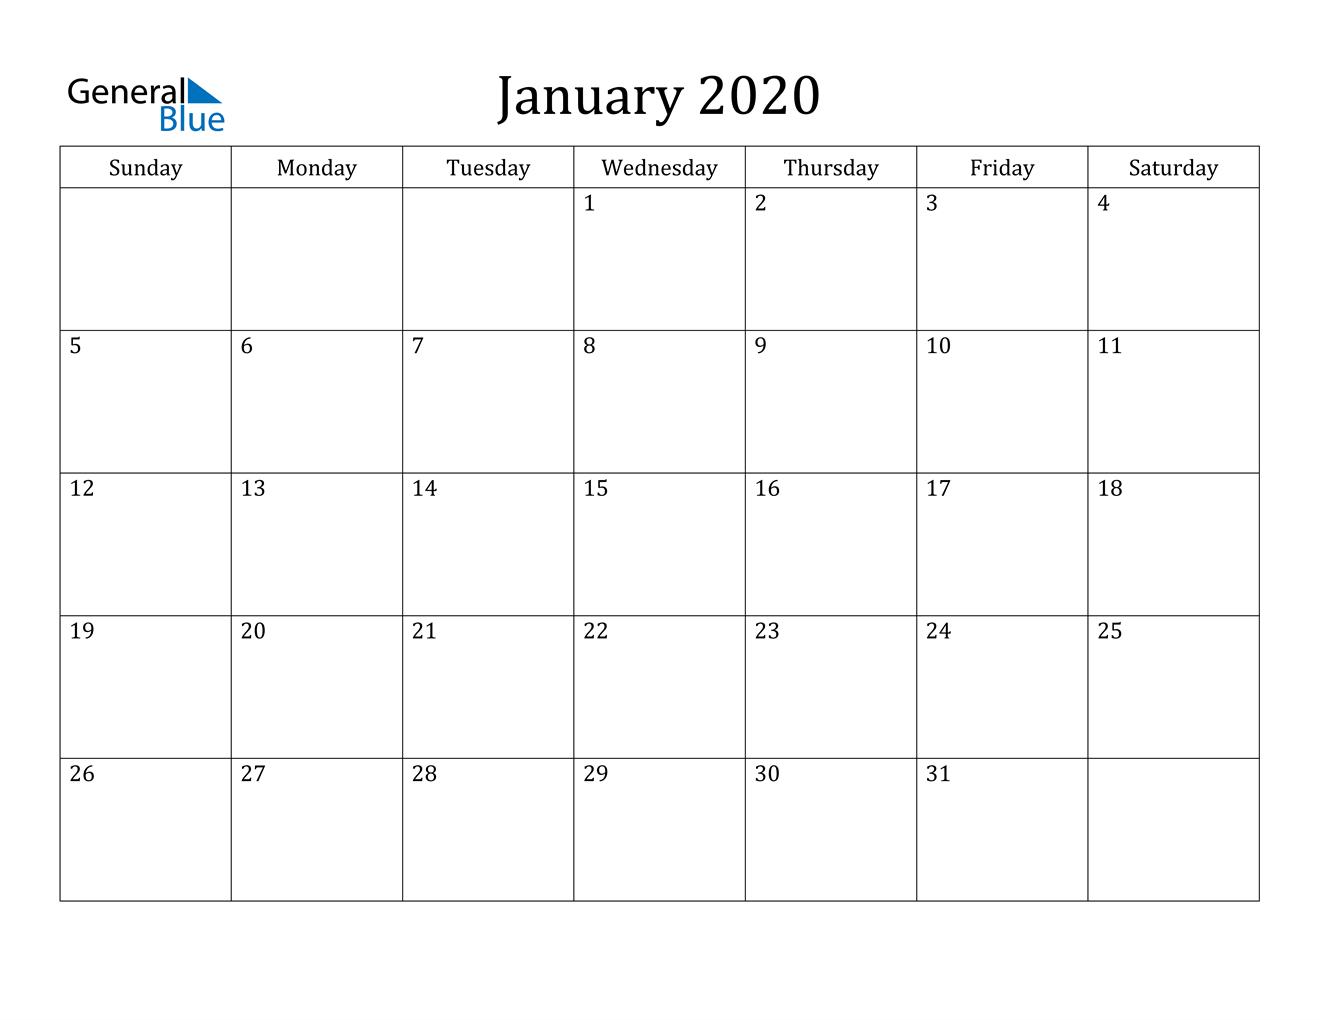 January 2020 Calendar - Pdf Word Excel pertaining to 2020 Etited Calendar